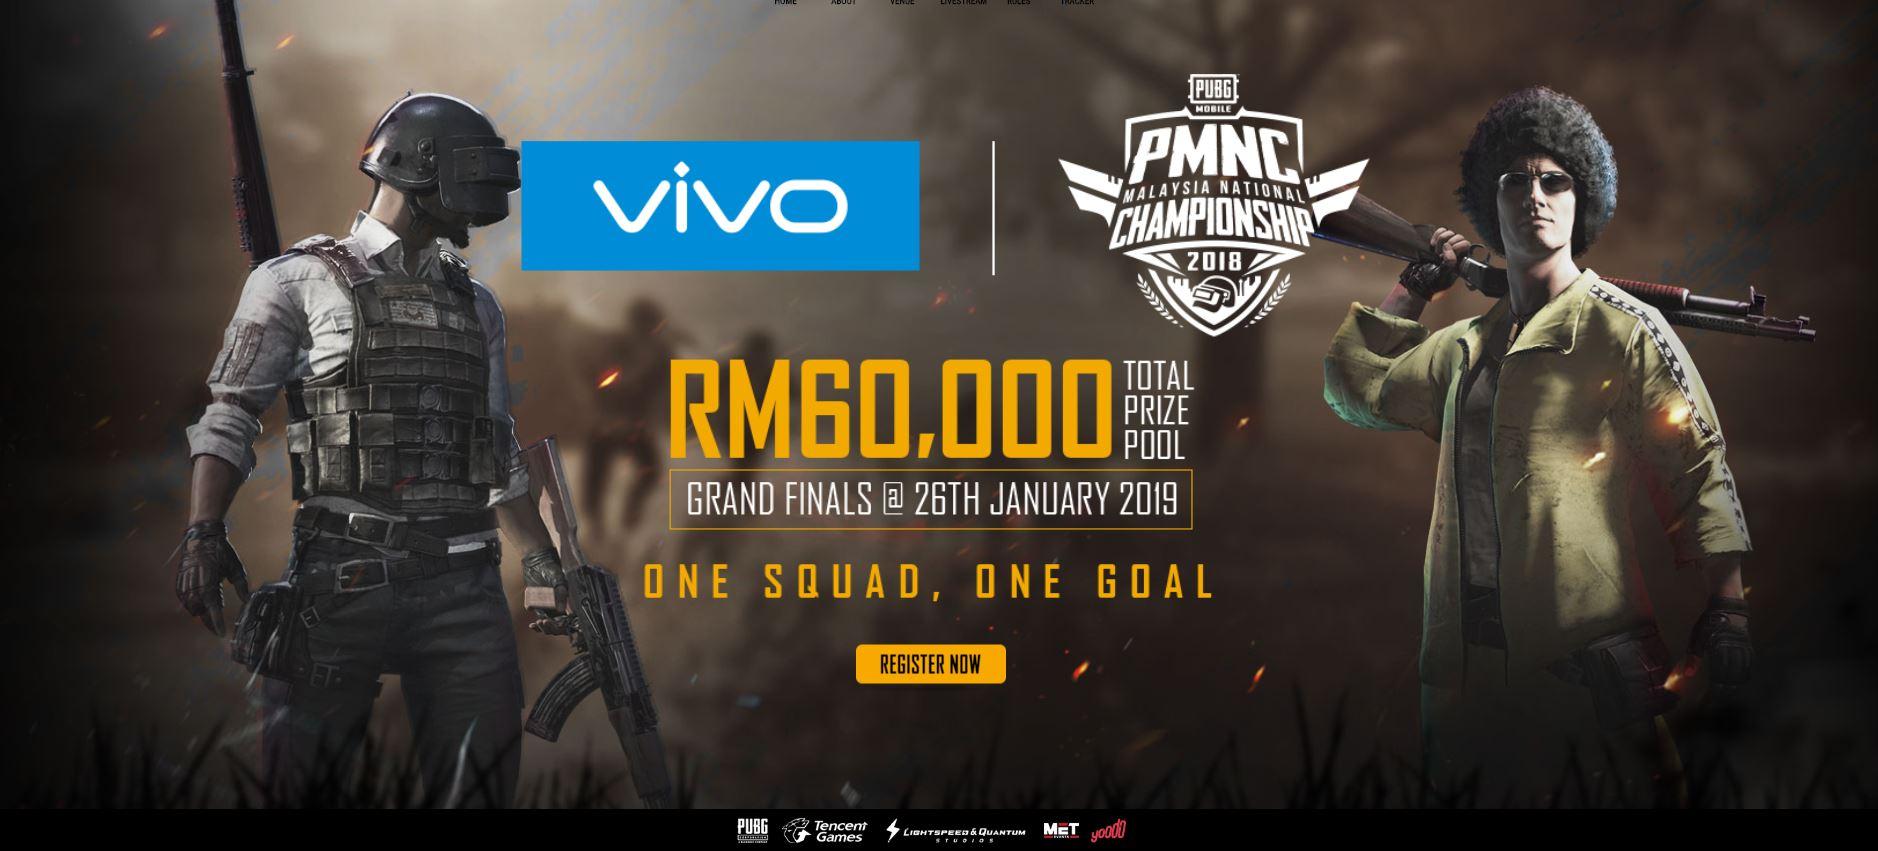 PUBG Mobile, PMNC Malaysia National Championship 2019, 2018, Yoodo, Tencent Games, Vivo